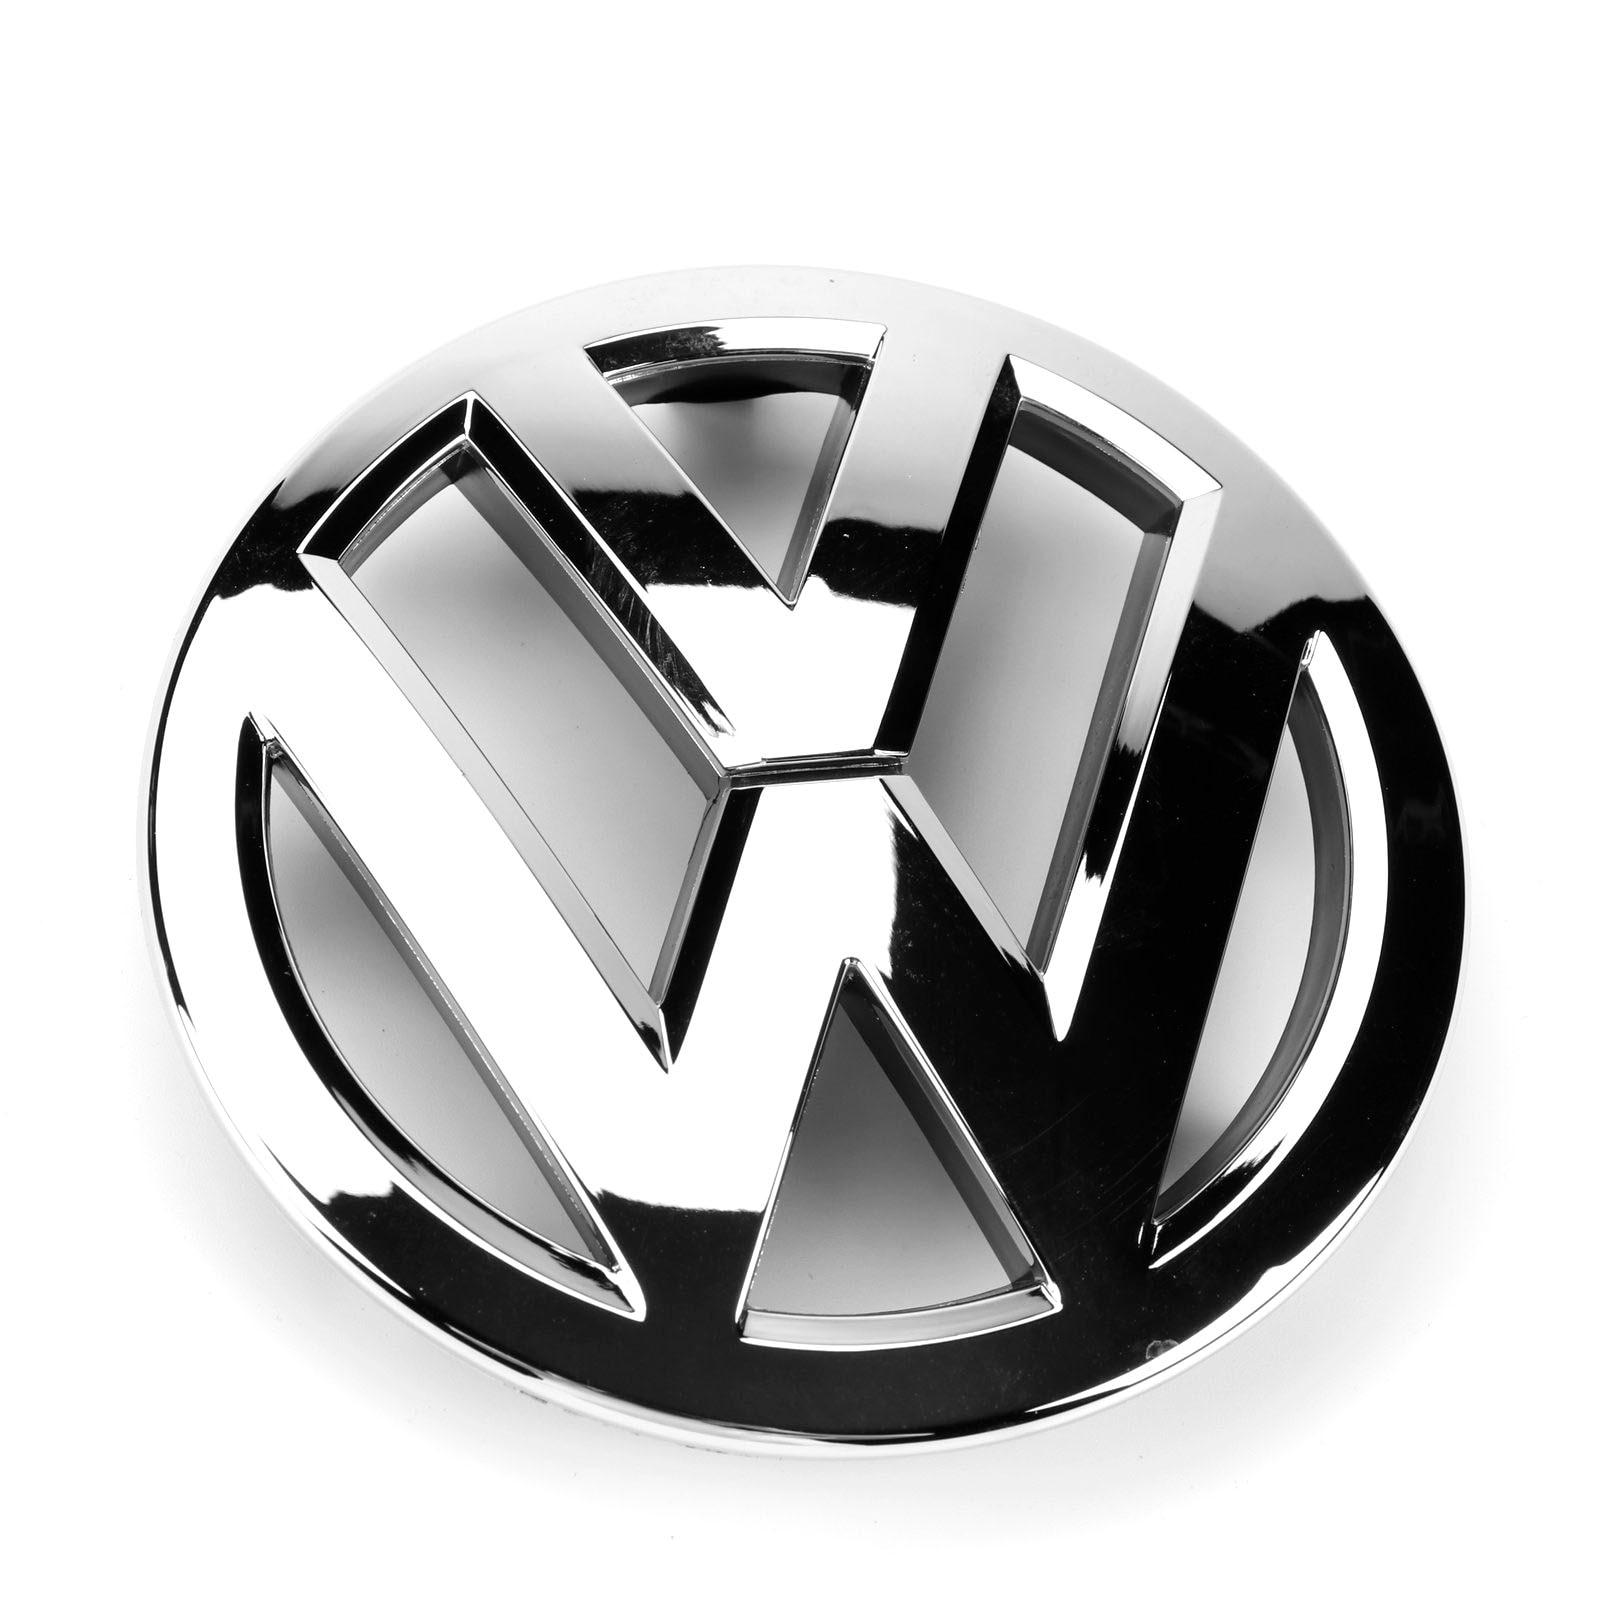 OEM 132MM cromo radiador delantero parrilla accesorios con logotipo para coche insignia Logo para Volkswagen VW Touran 2011